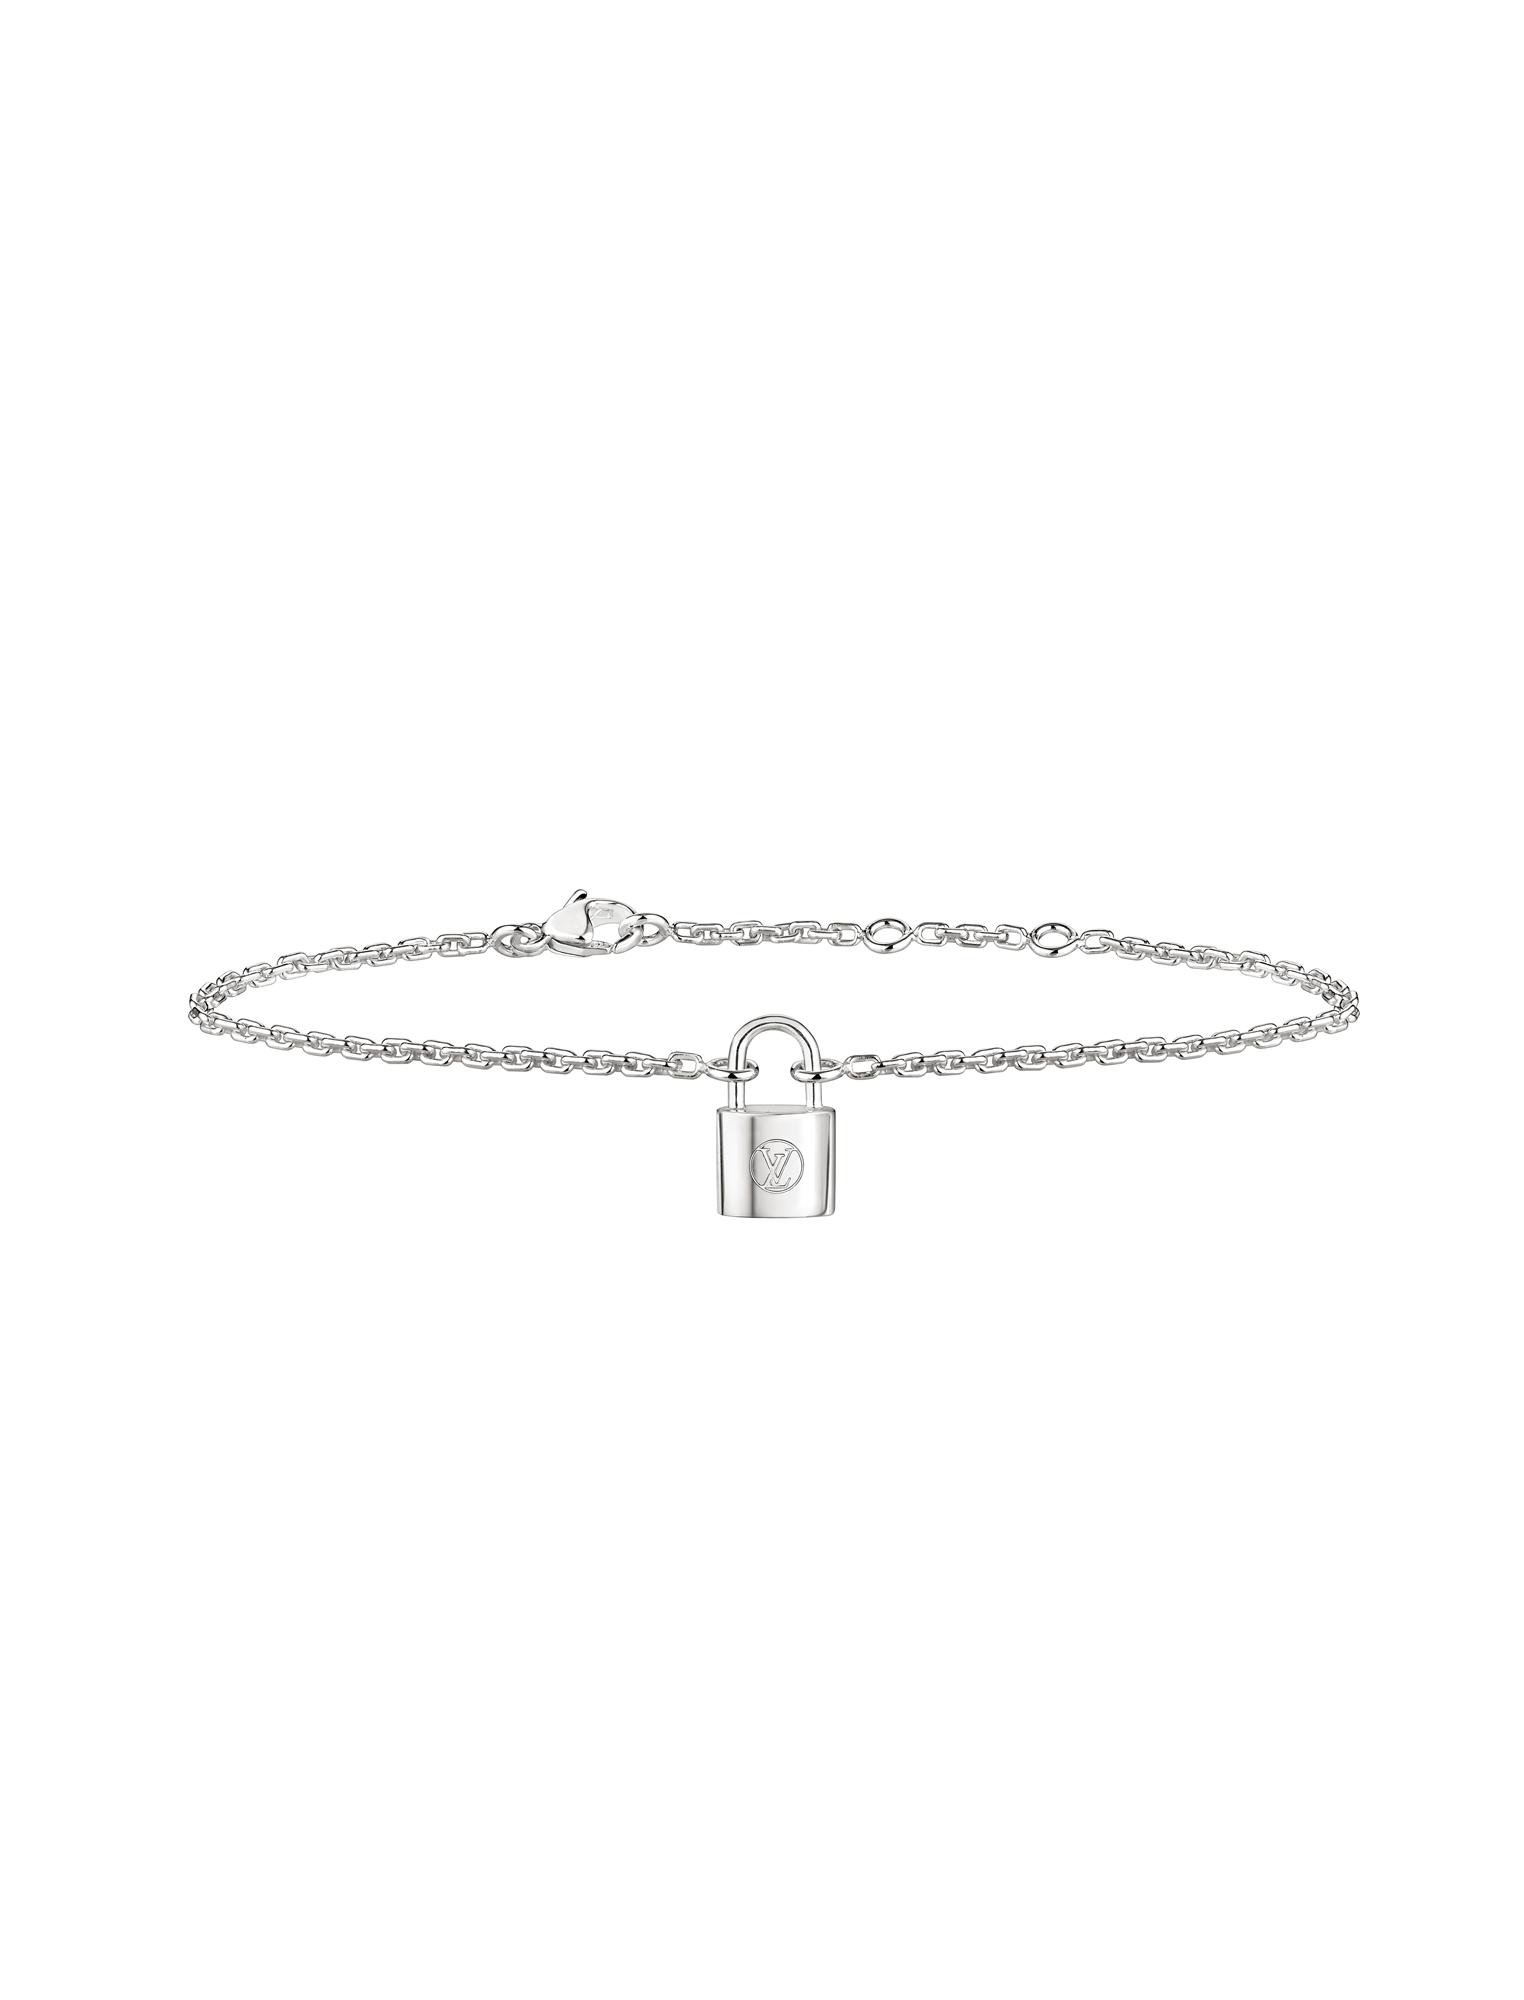 Silver_Lockit_bracelet_fermé;